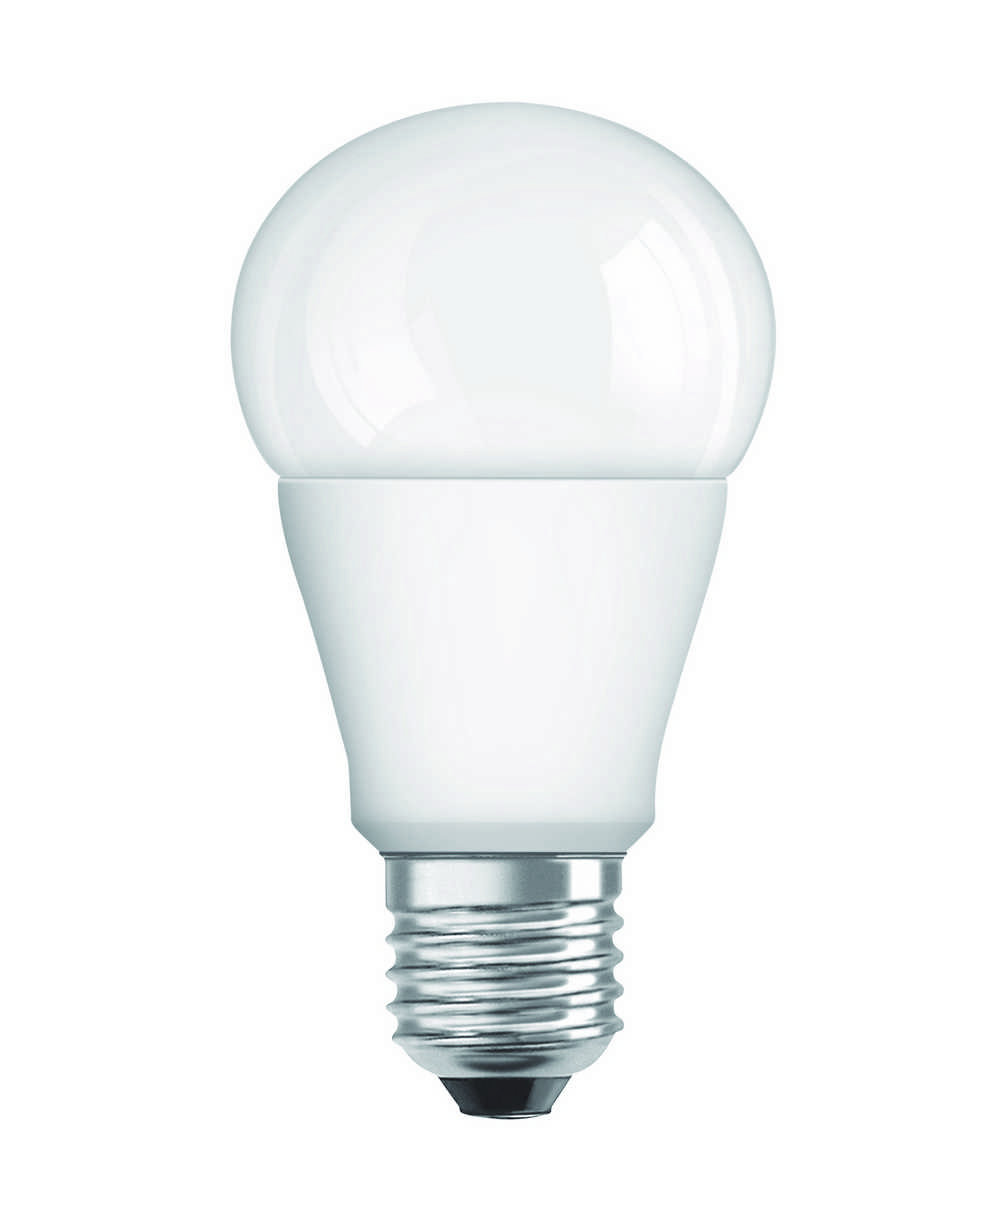 LED STAR CLAS A75 E27 11W 1055LM WW